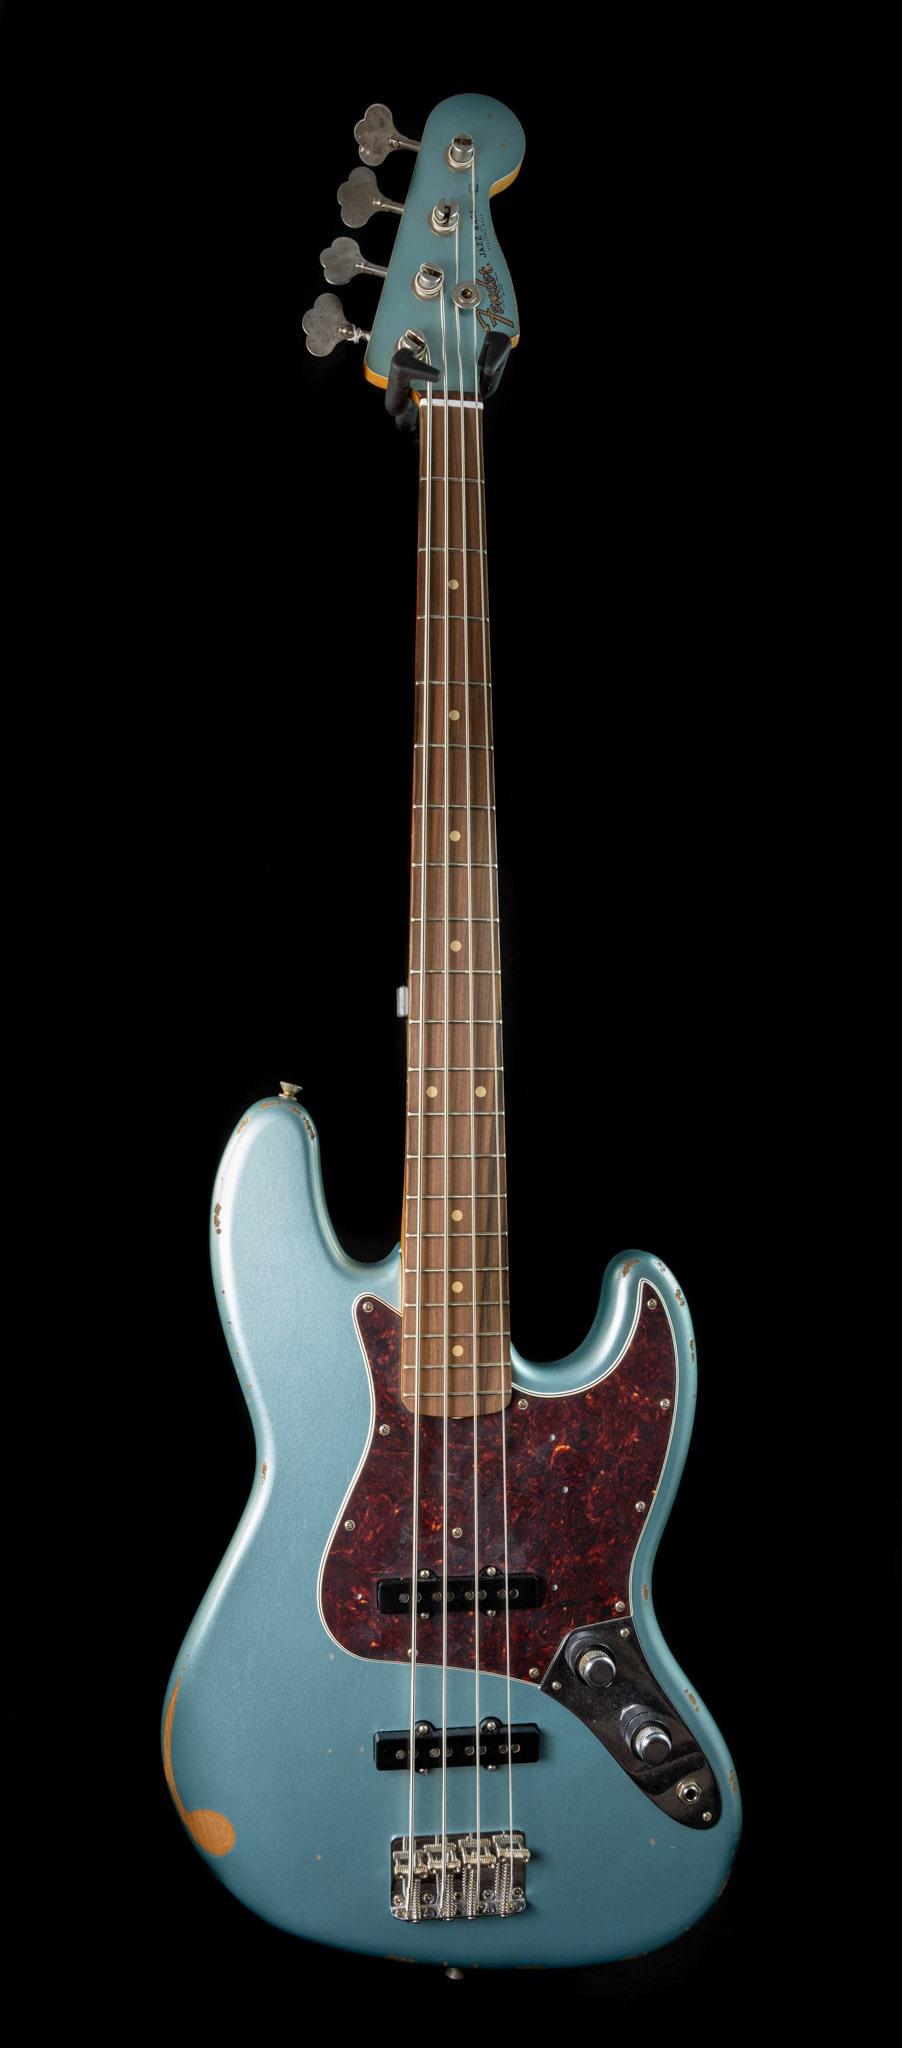 Fender - Limited - 60th Anniversary Road Worn Jazz Bass in Firemist Silver